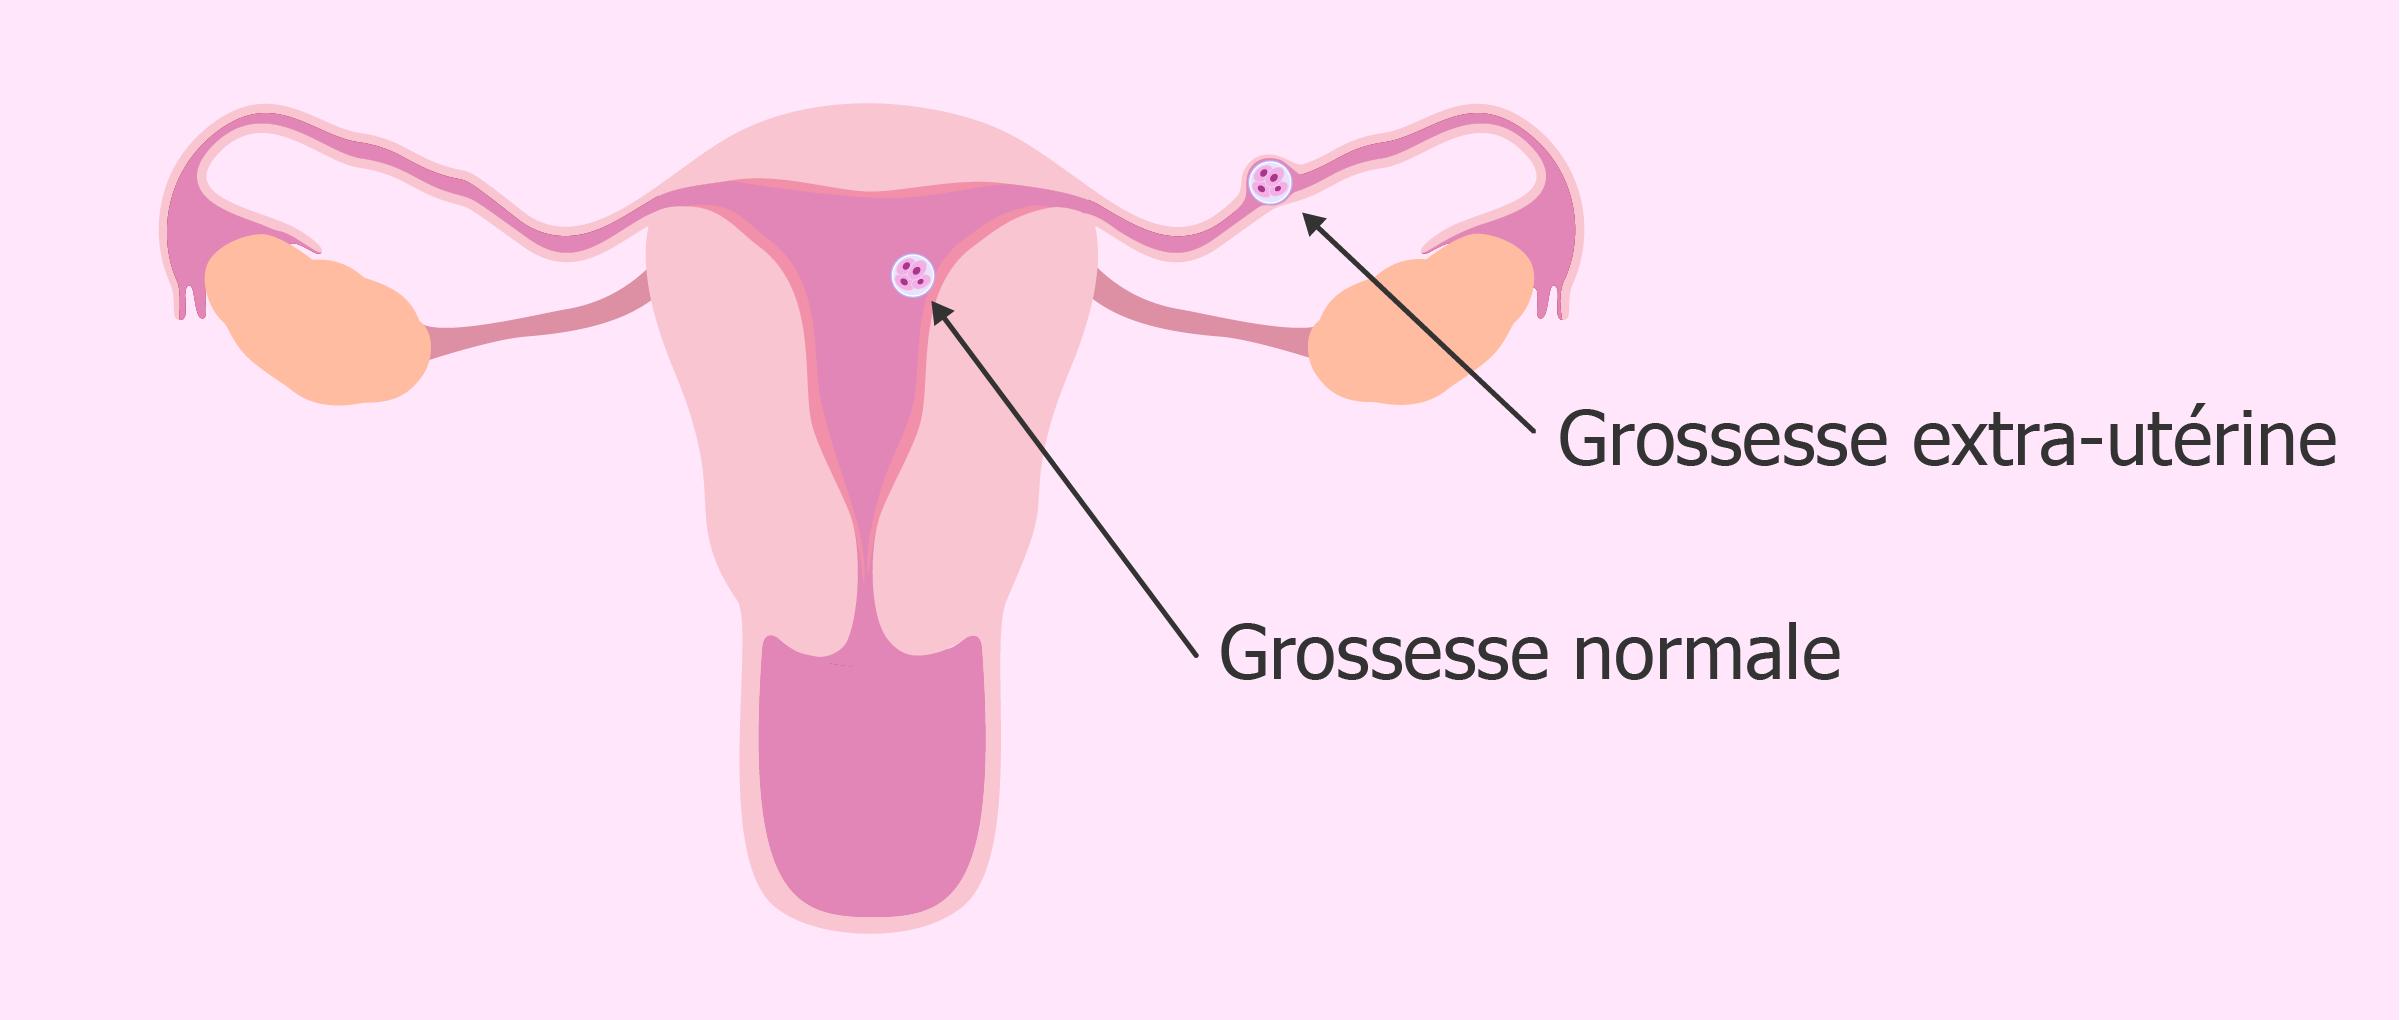 Grossesse extra ut rine apr s un transfert embryonnaire - Fausse couche grossesse extra uterine ...